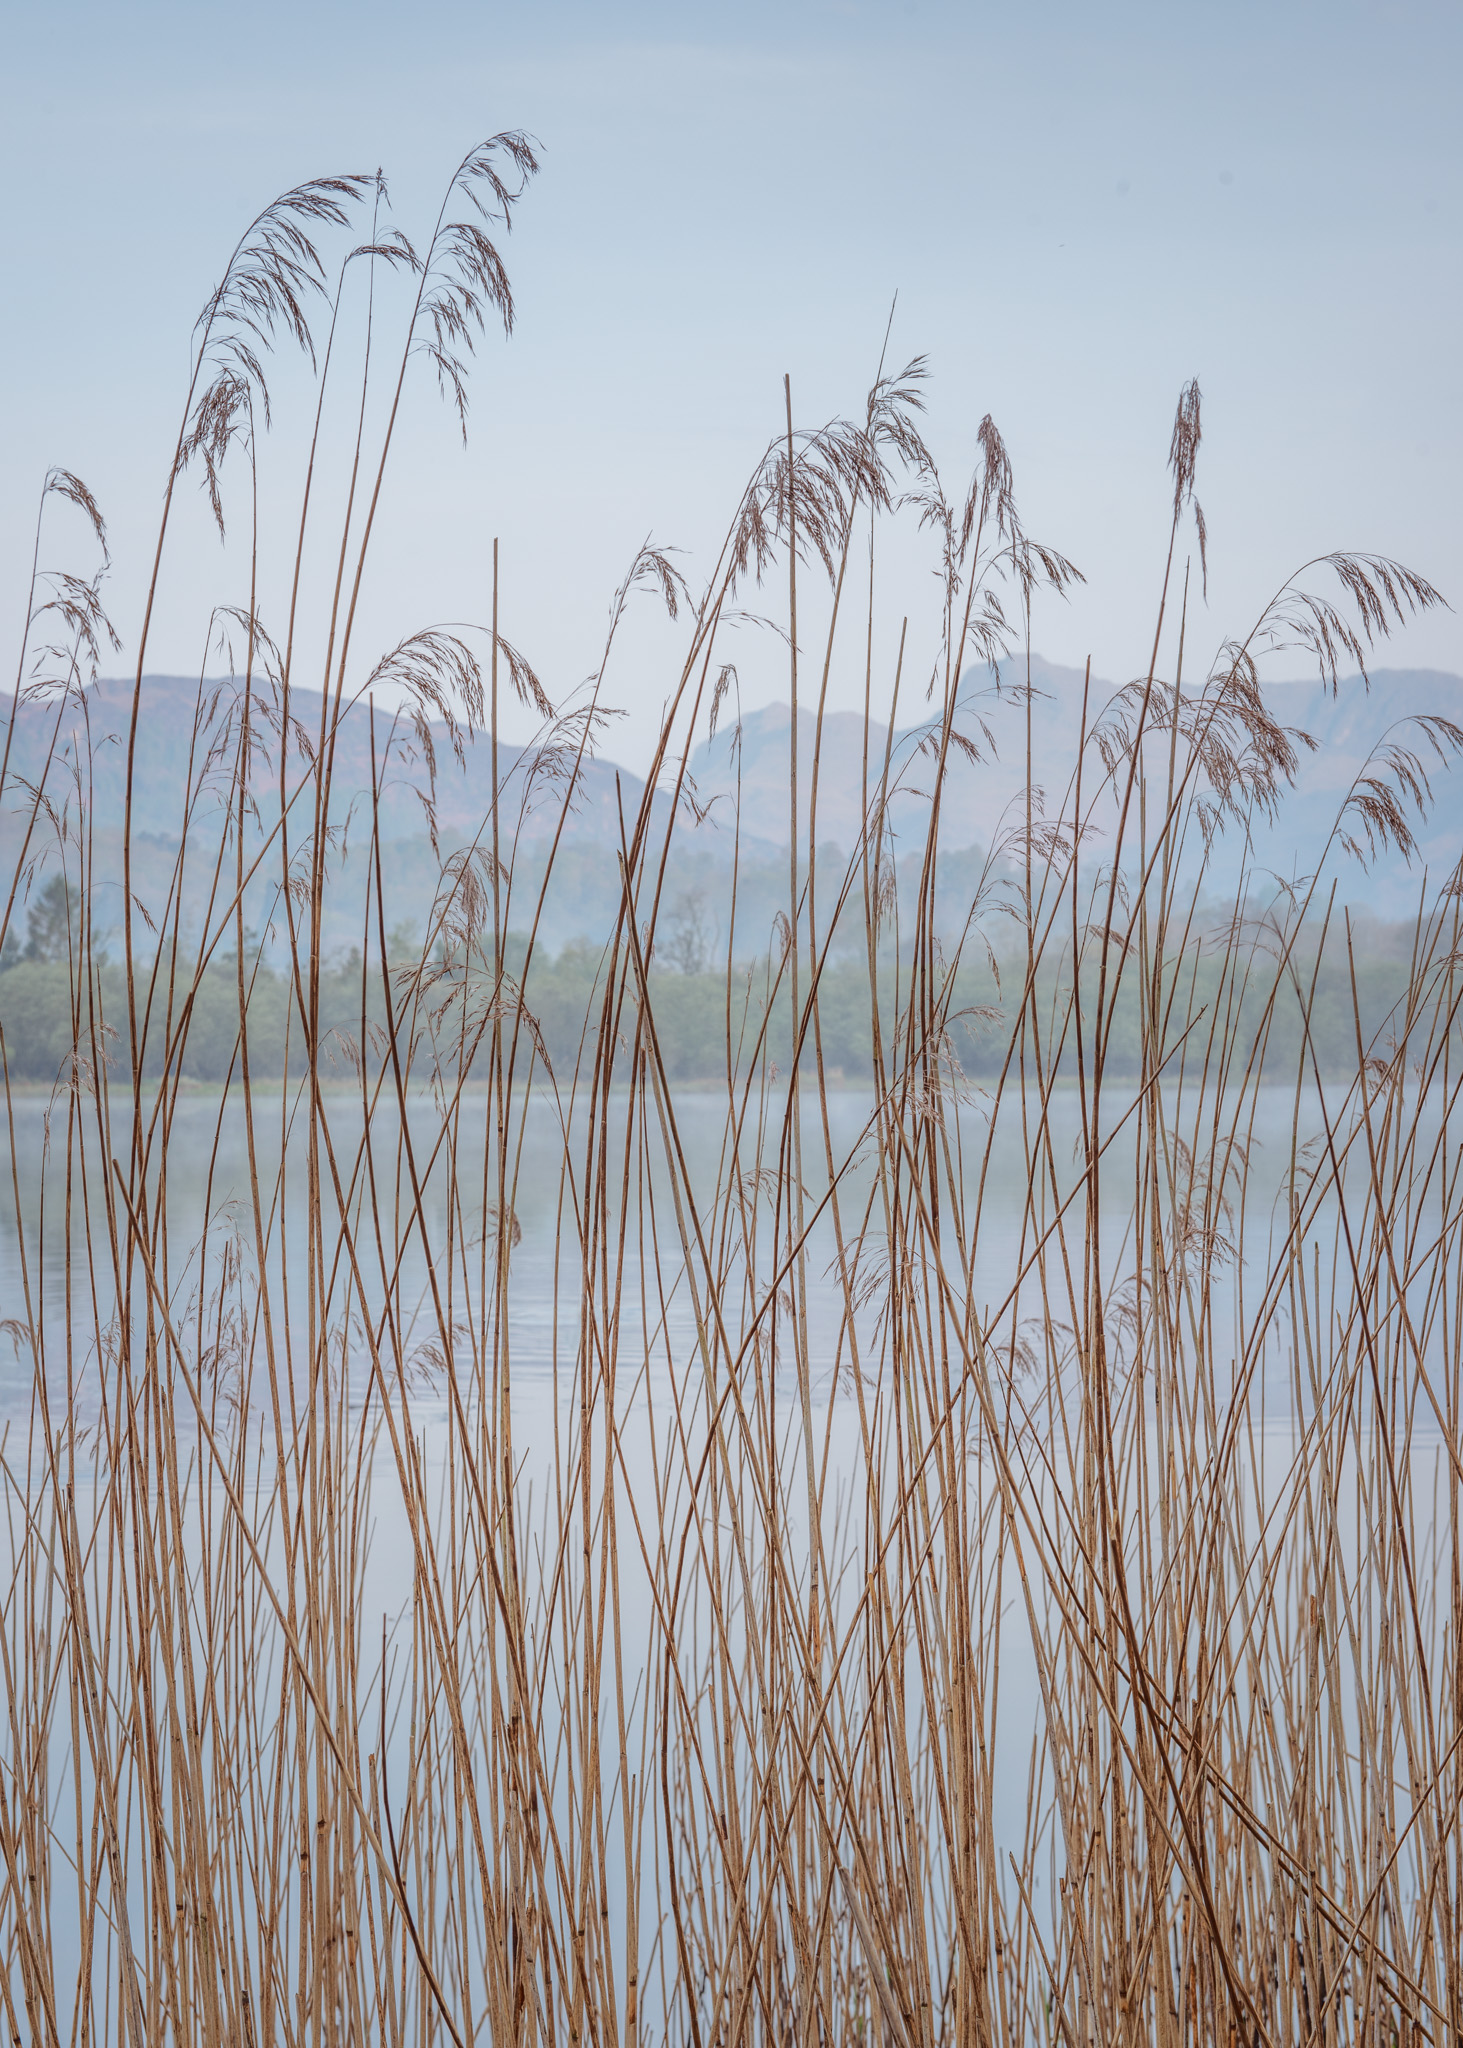 Reeds at Elterwater